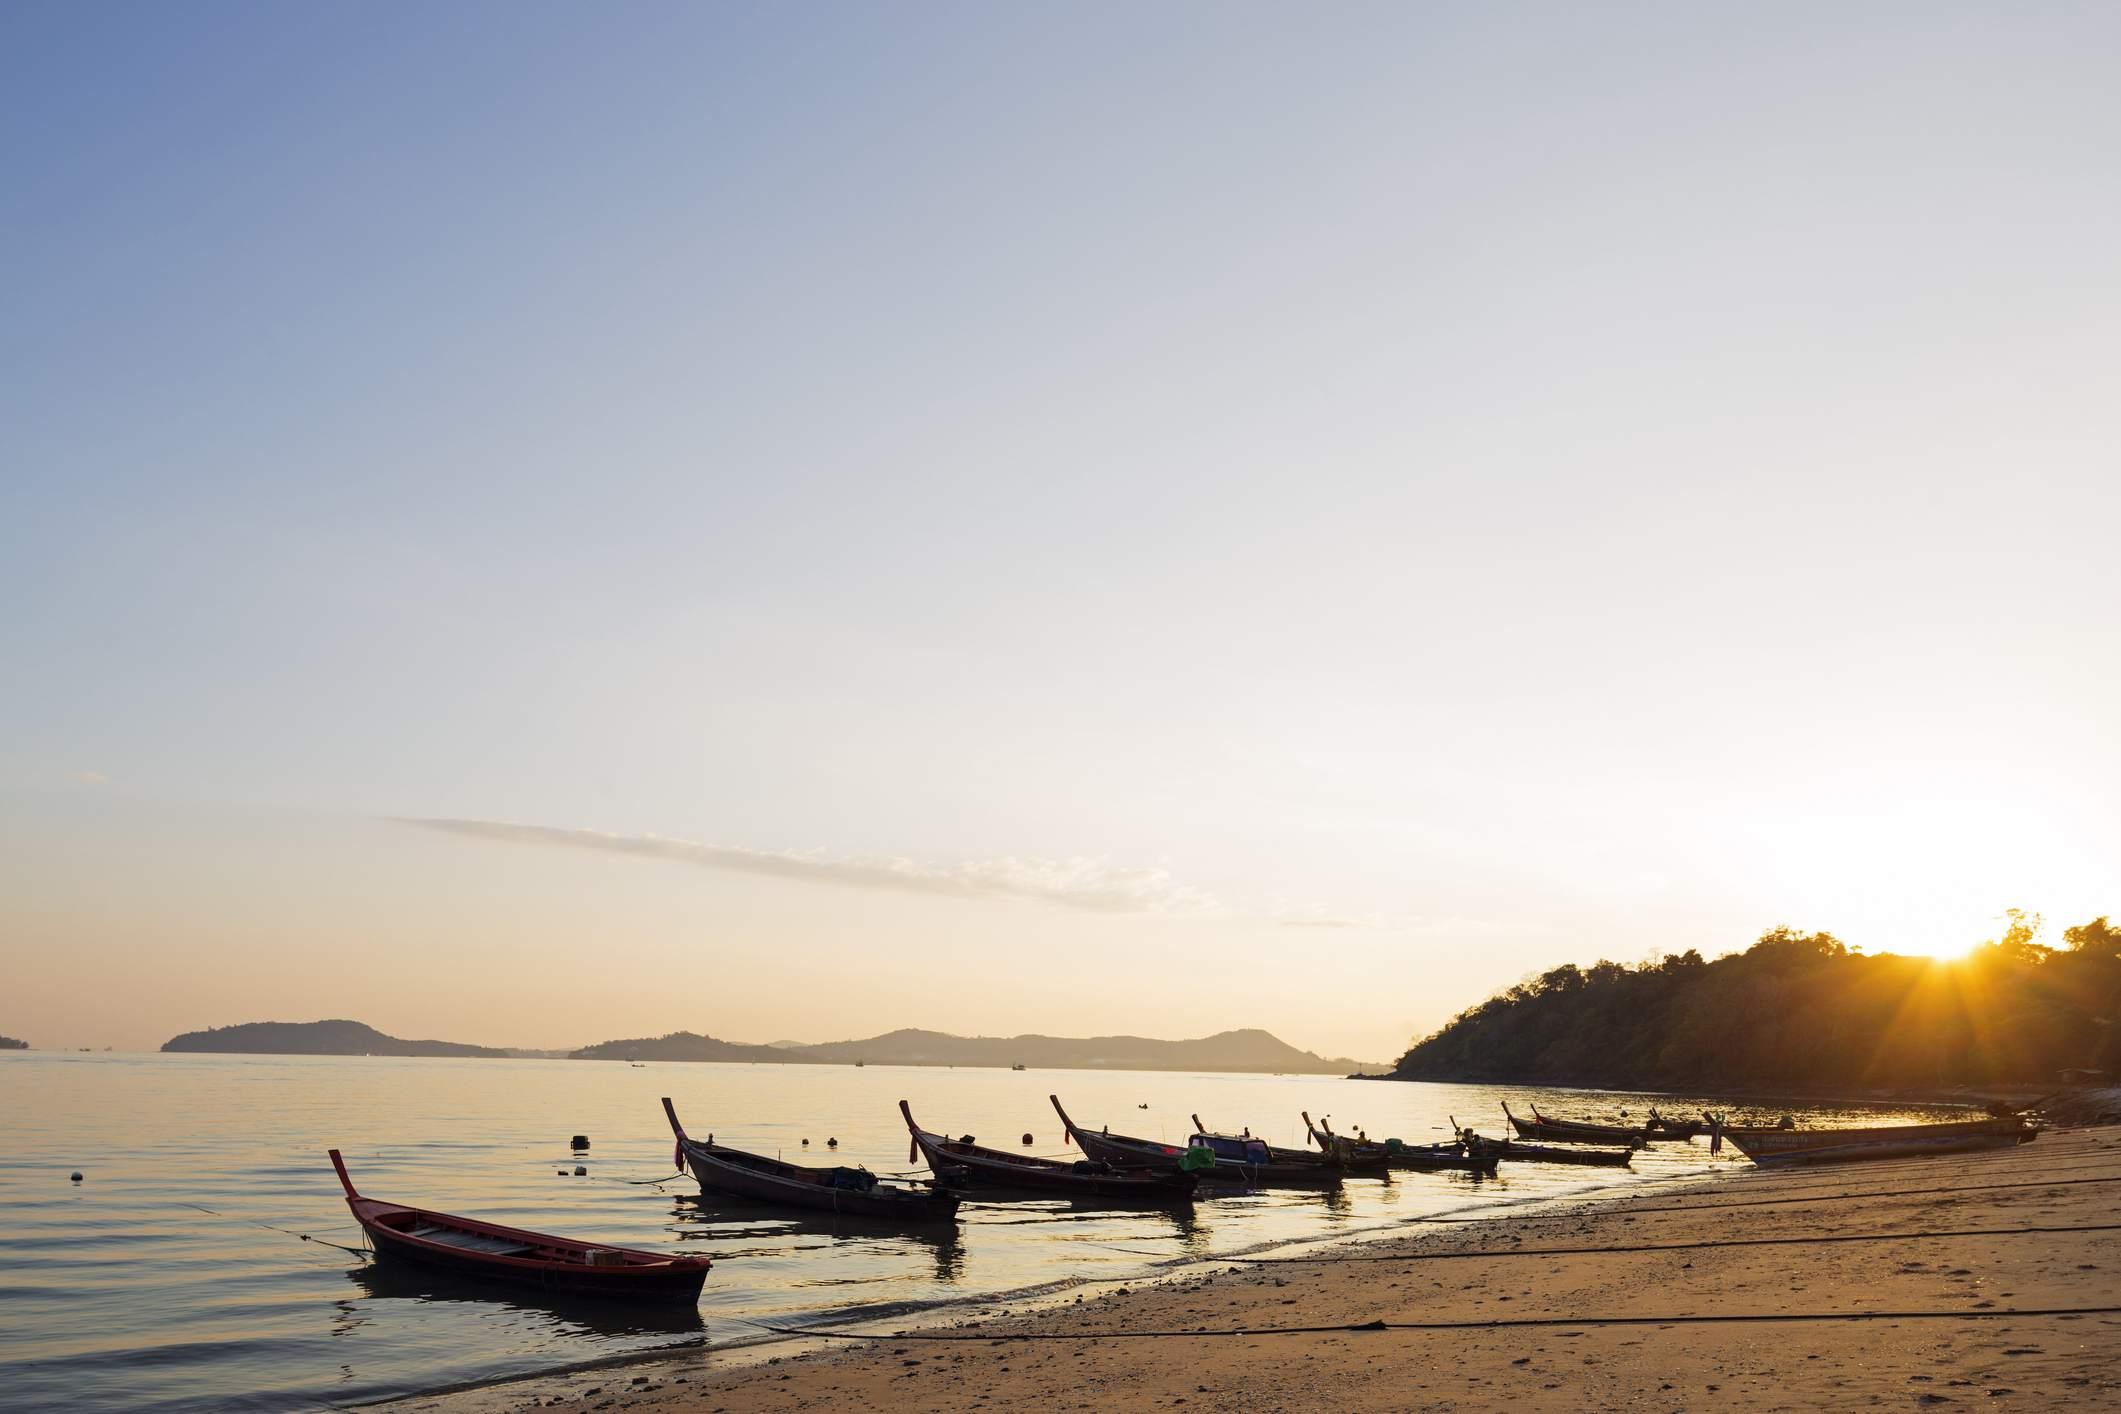 Thailand, Phuket, Scenic landscape with Siray Bay at sunset